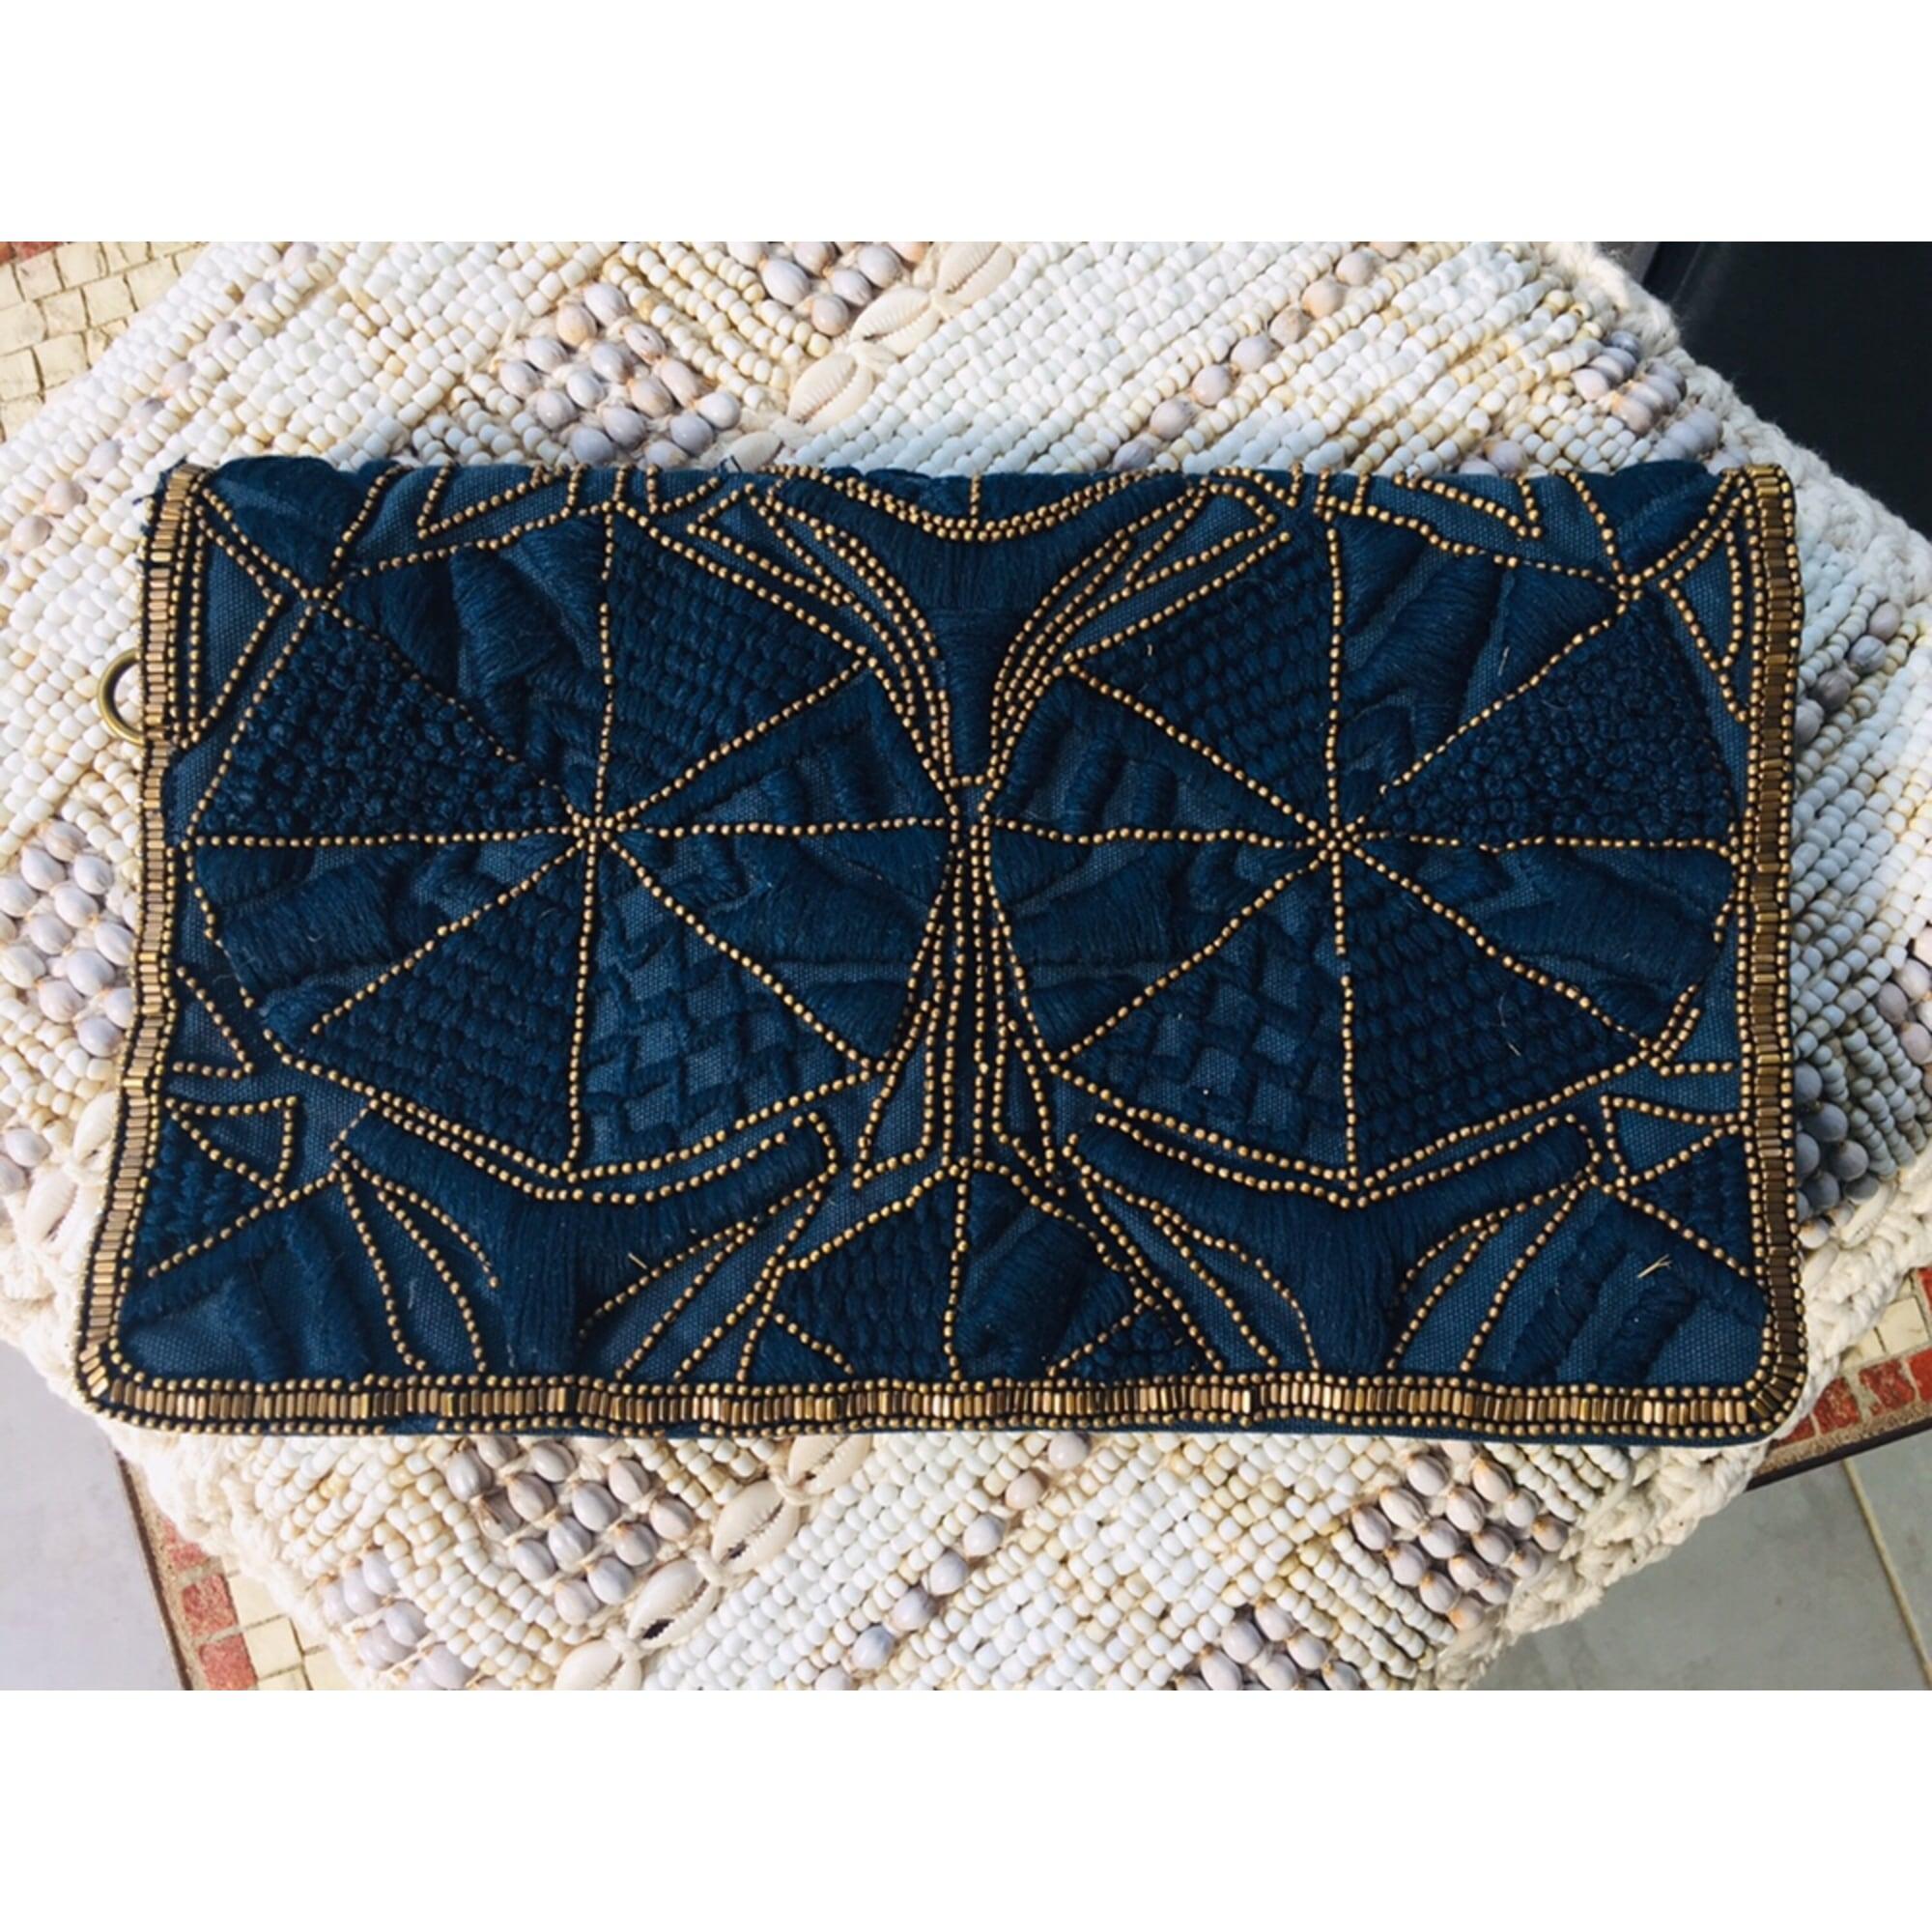 Pochette ASOS cuir bleu